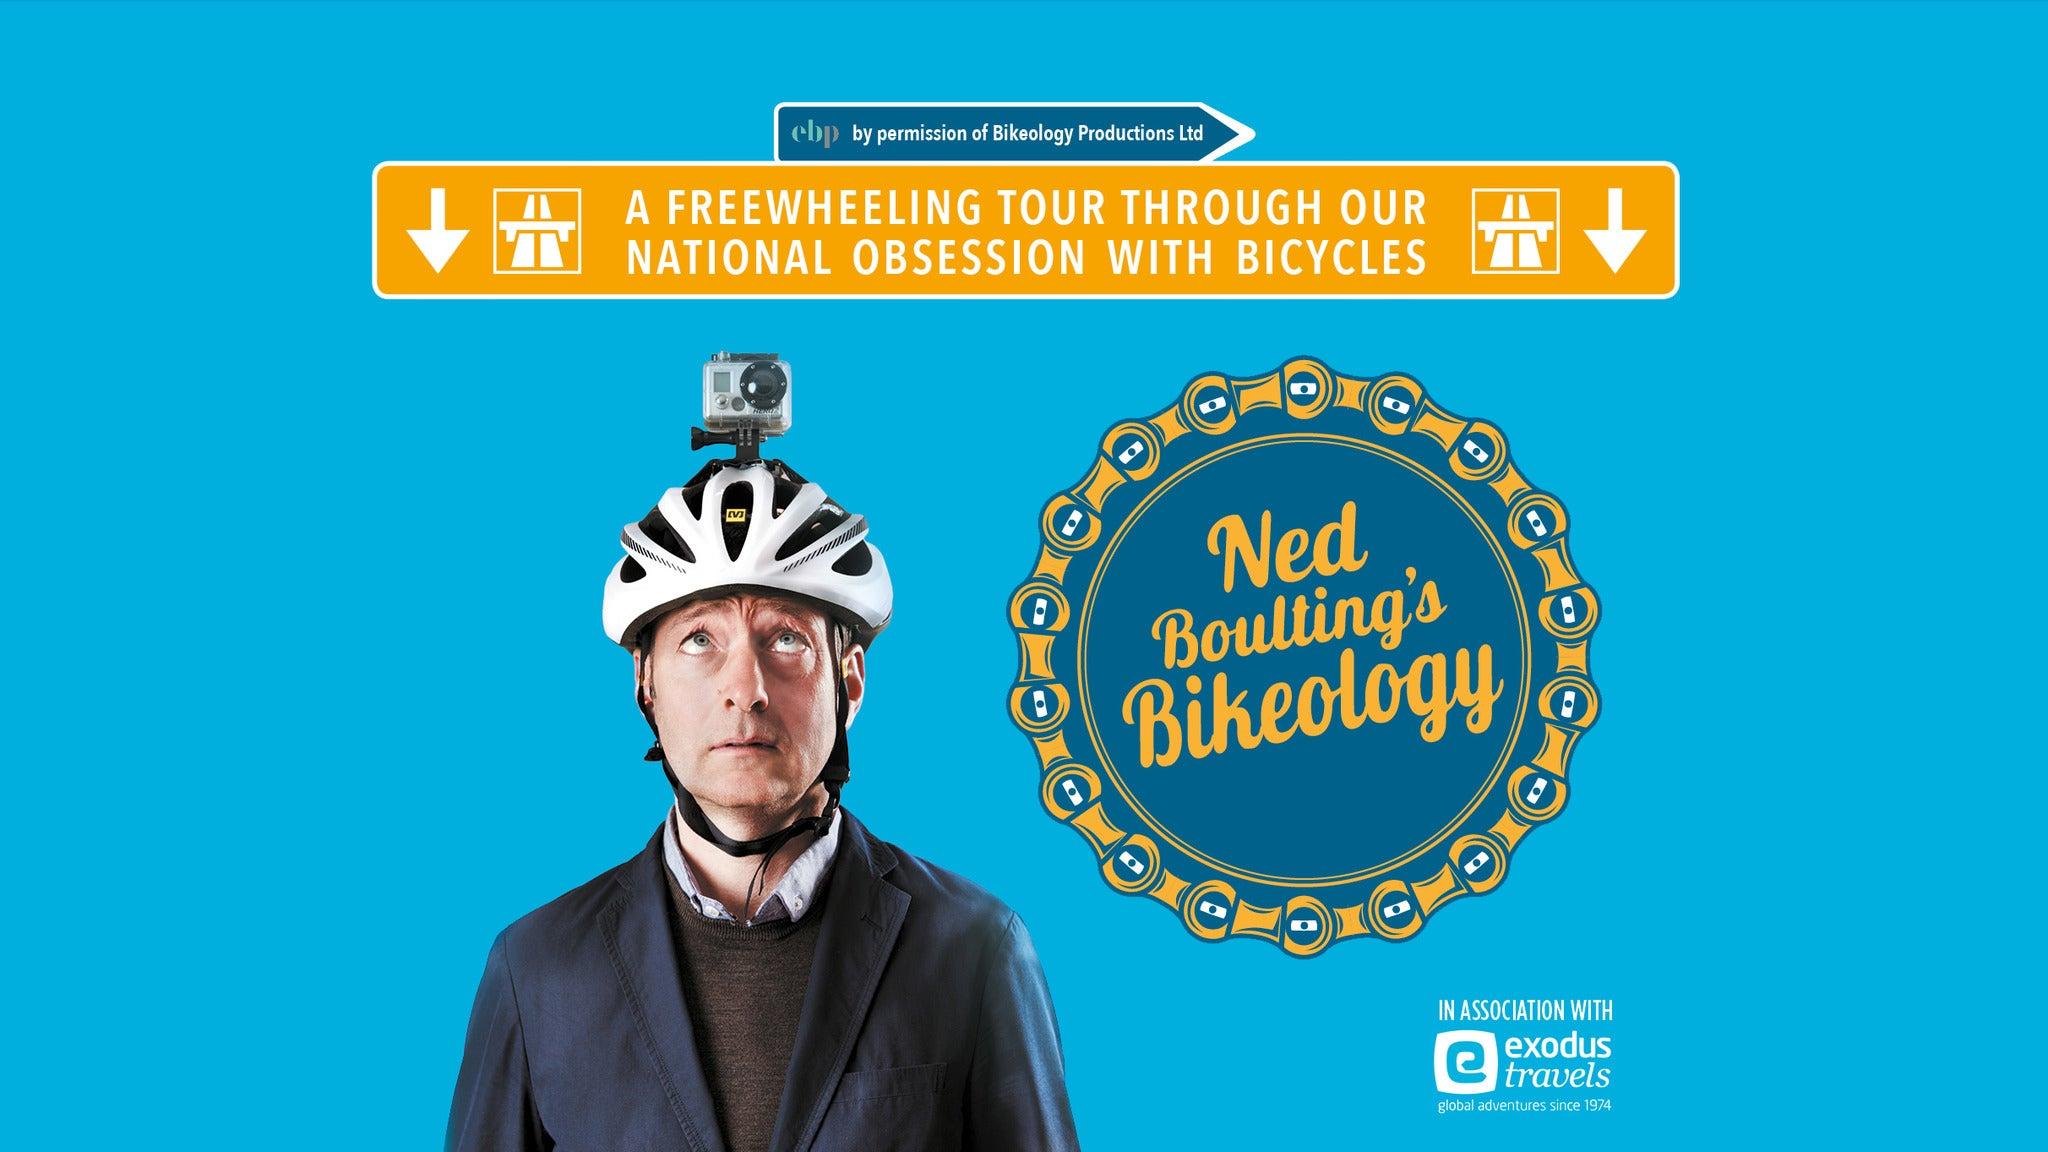 NED BOULTING'S BIKEOLOGY